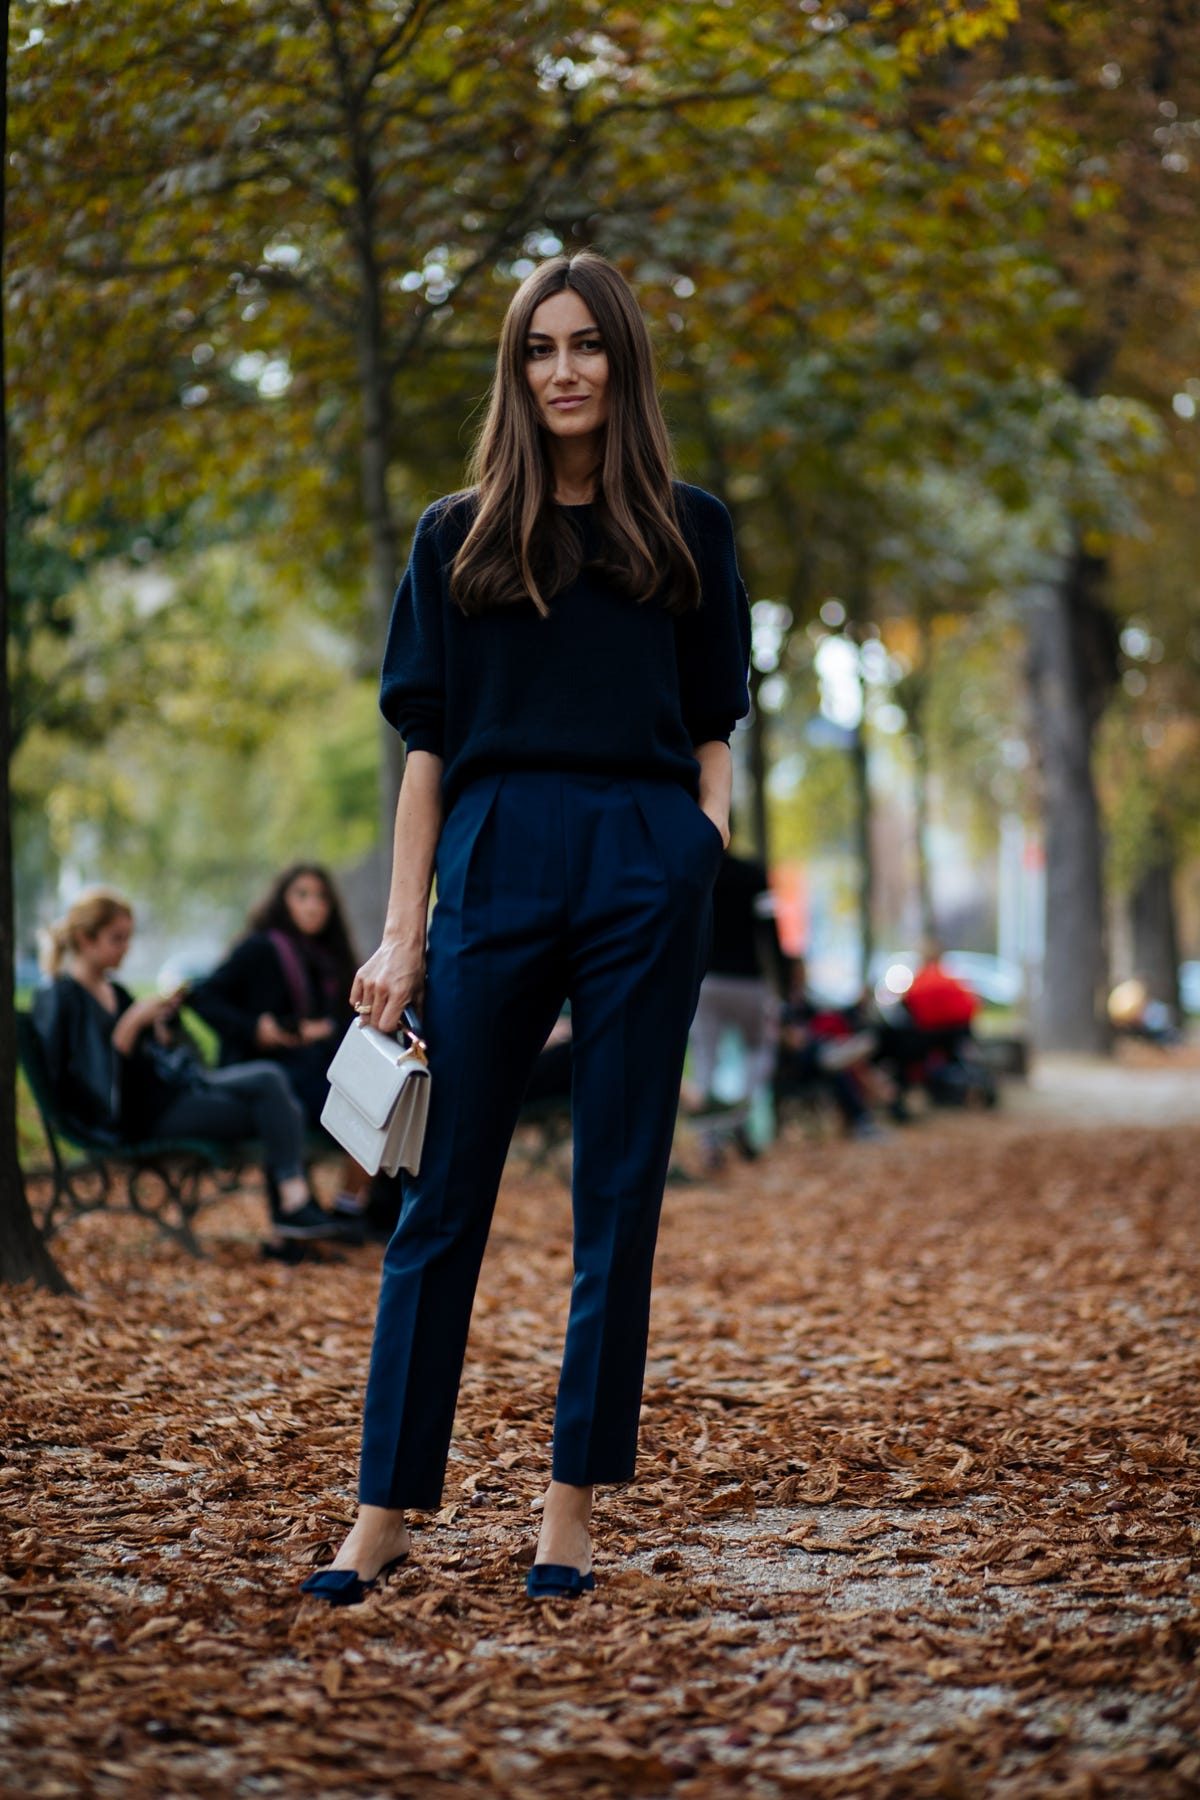 394b1e00e2e3 All The Best Street Style At Paris Fashion Week SS18